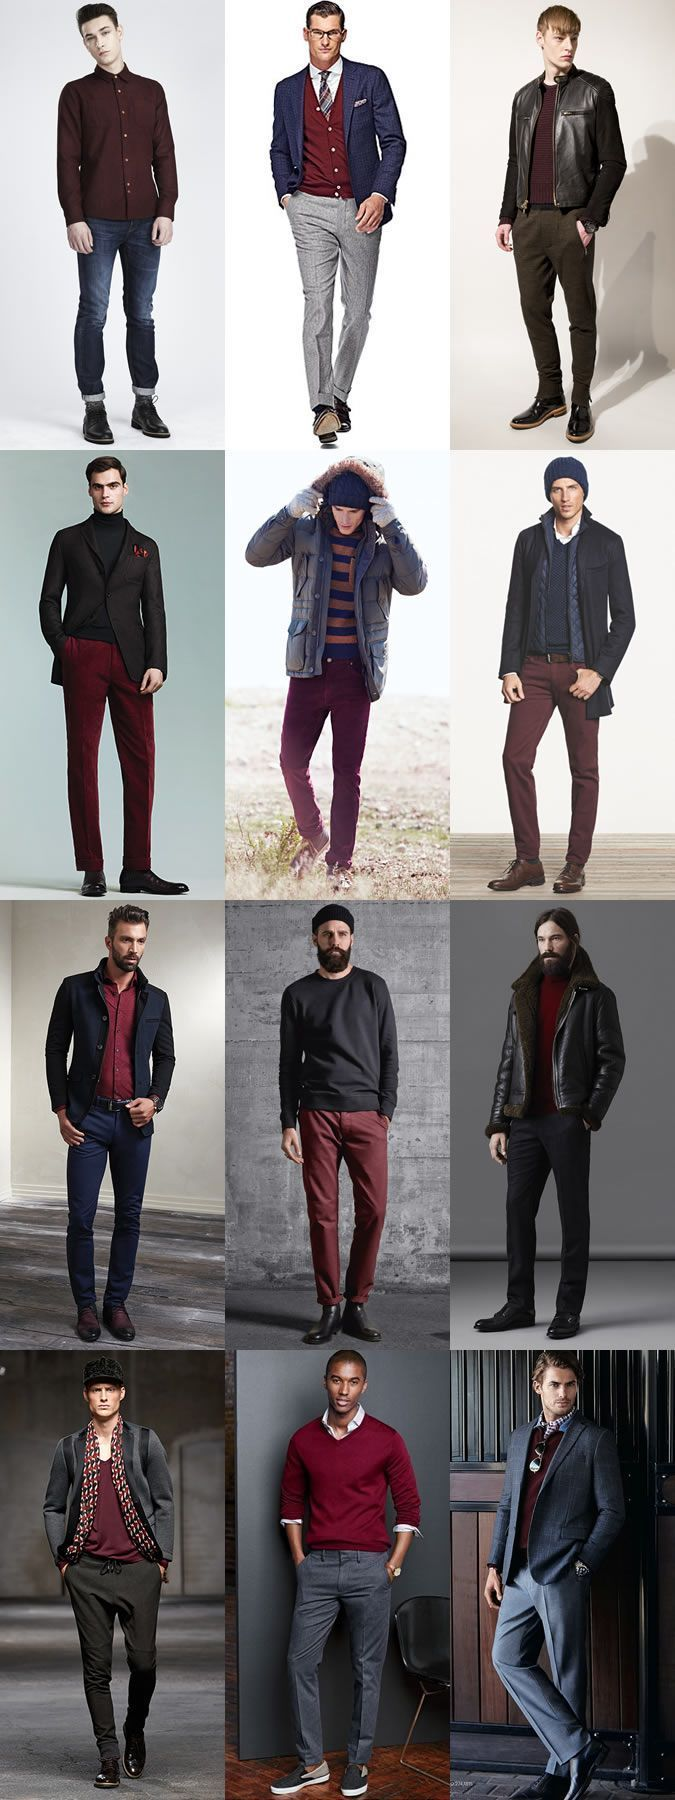 Men s Fashion Guide  2014 Autumn Winter Fall Ways To Wear Burgundy Staples  Lookbook 7ee4436f0